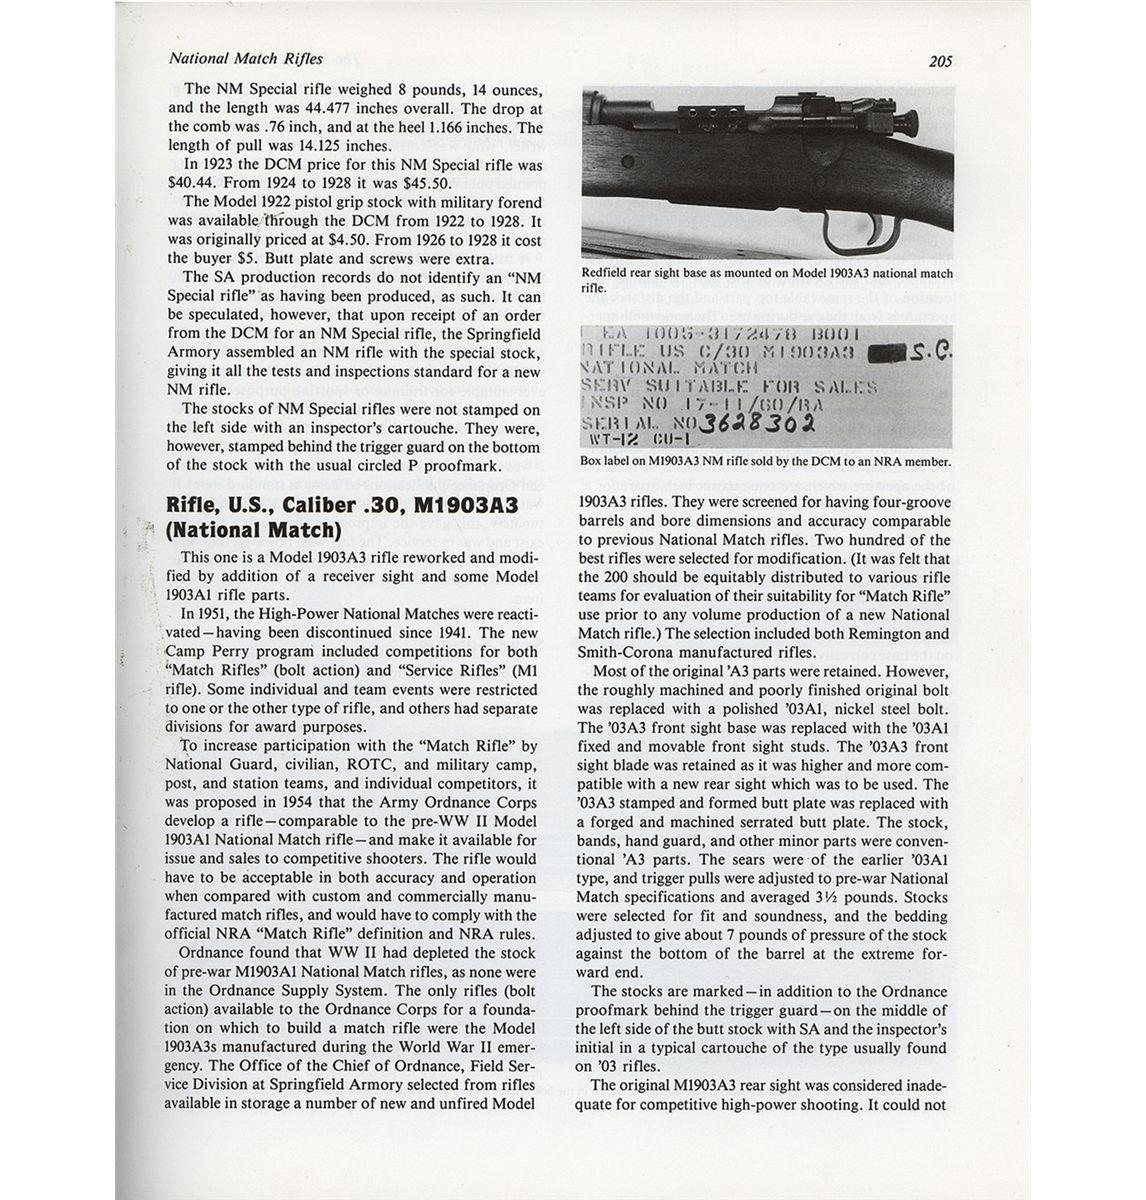 smith corona serial numbers 1903a3